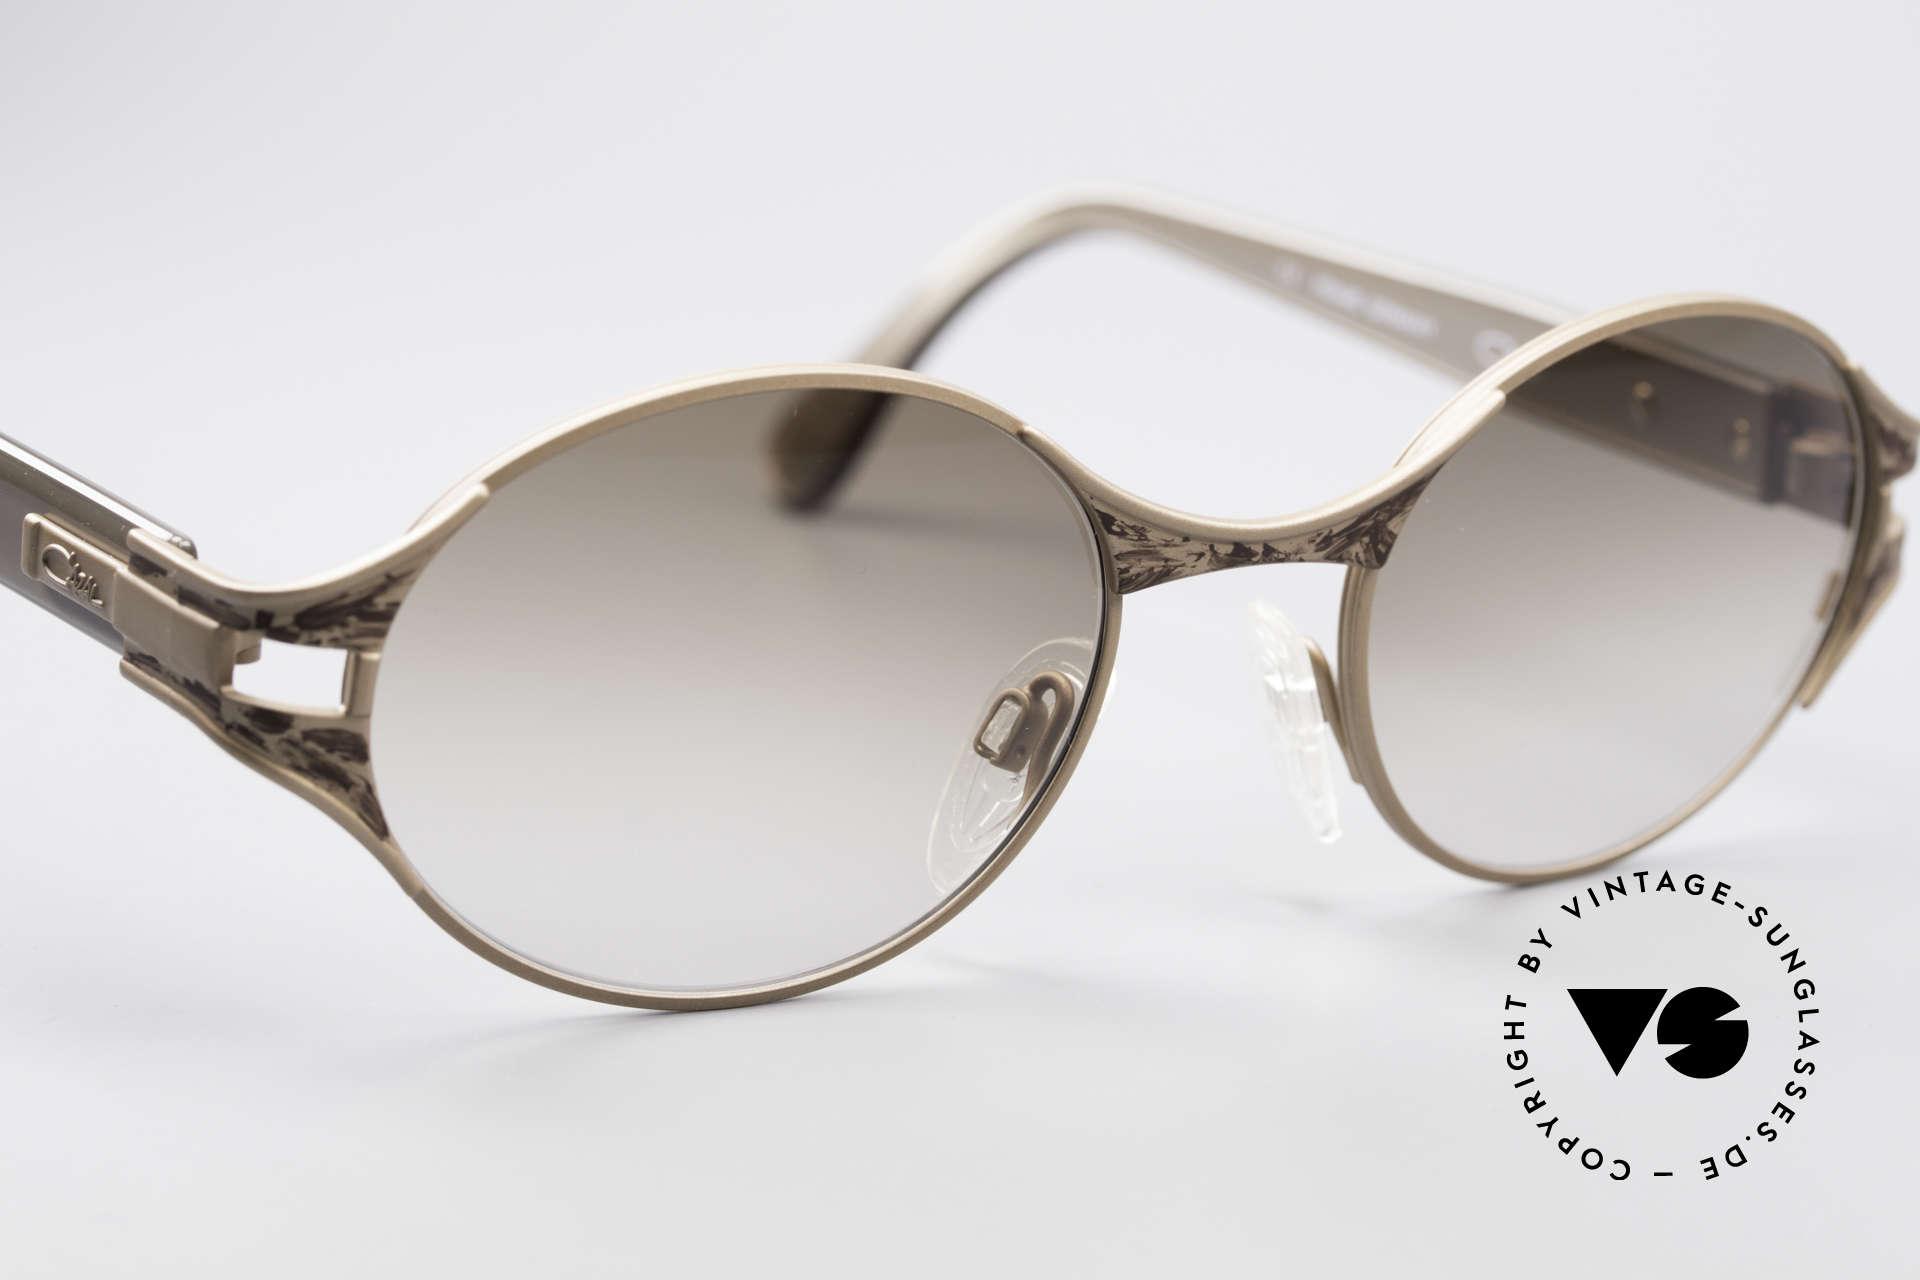 Cazal 281 90's Sunglasses Oval Round, the frame is made for optical lenses or sun lenses, Made for Women